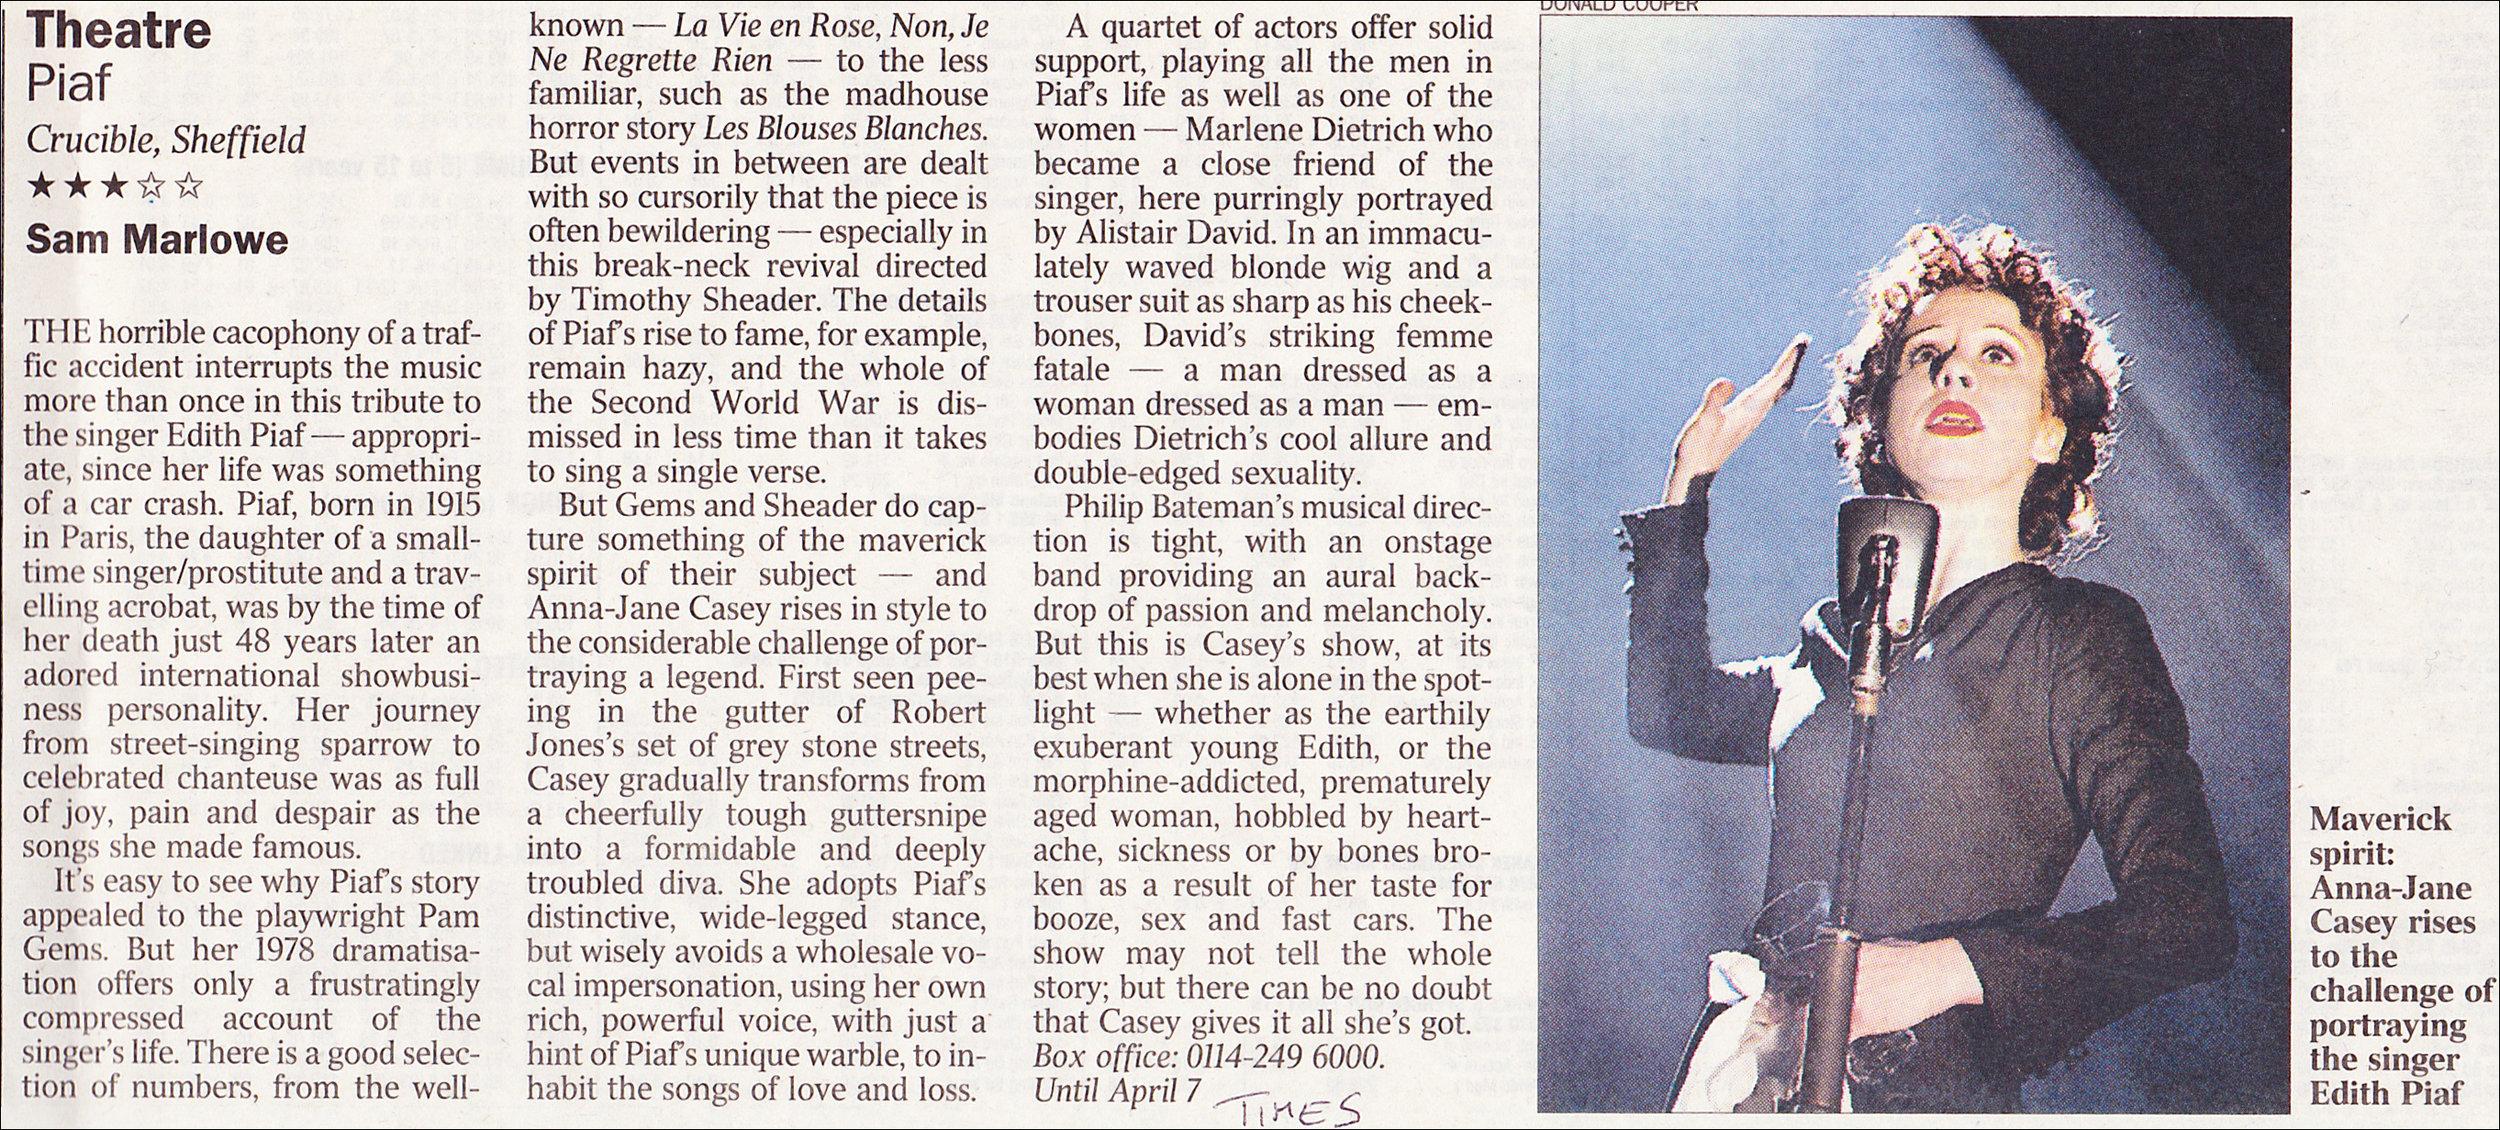 Phil-Bateman-Press-Piaf-The-Times.jpg